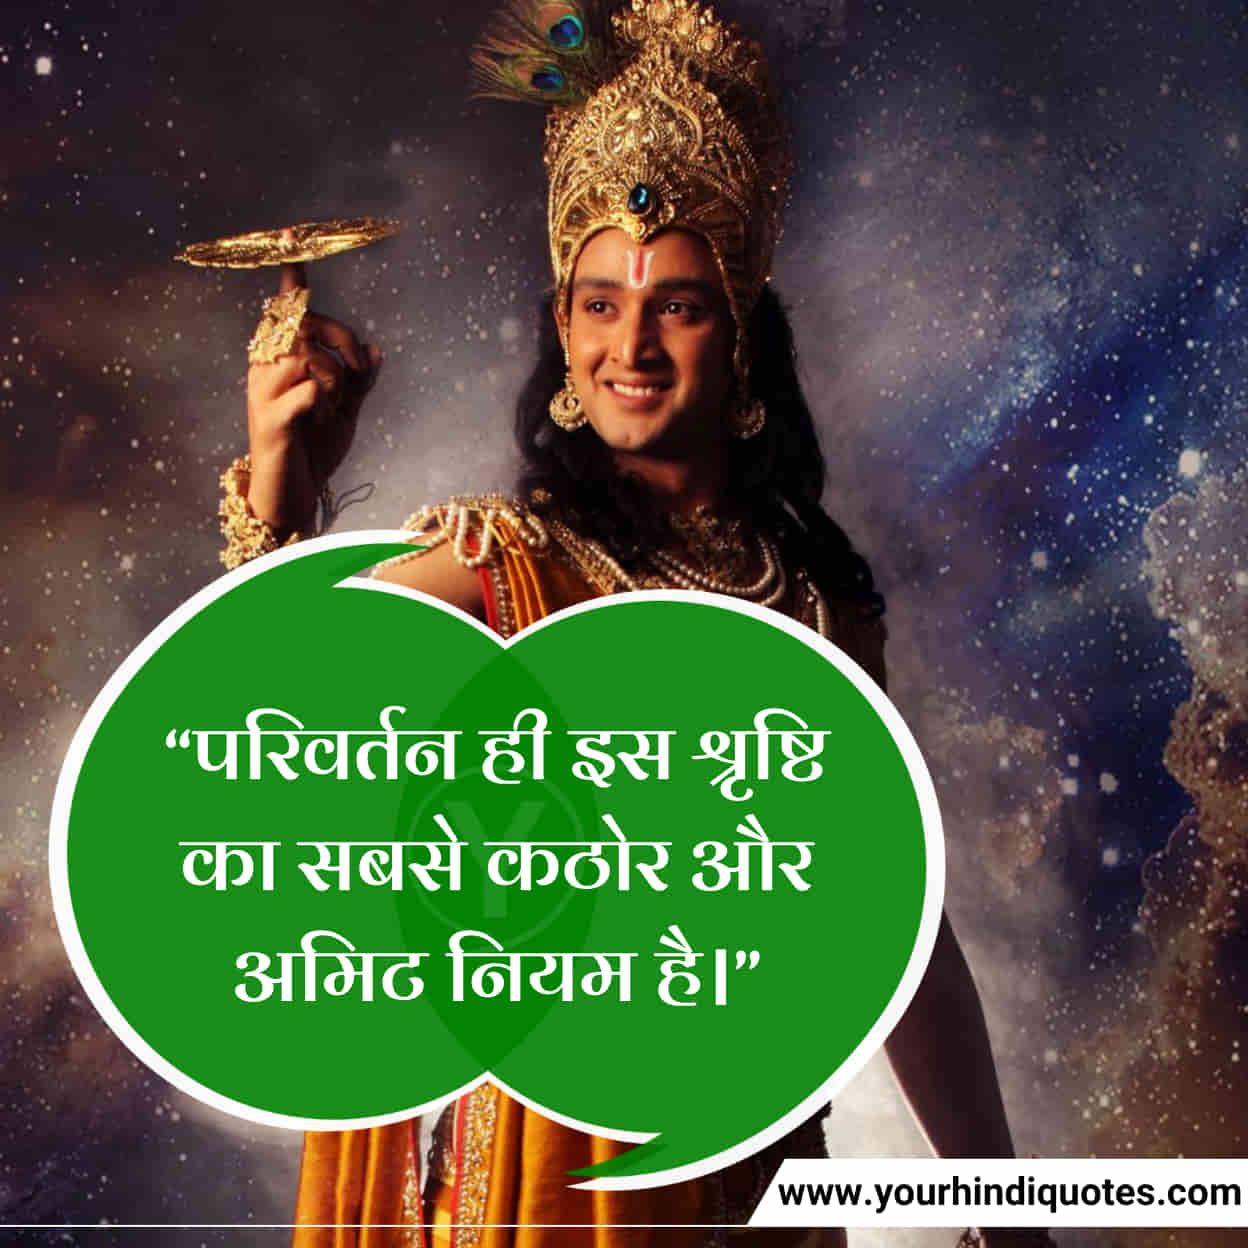 Bhagwat Gita Motivational Quotes In Hindi